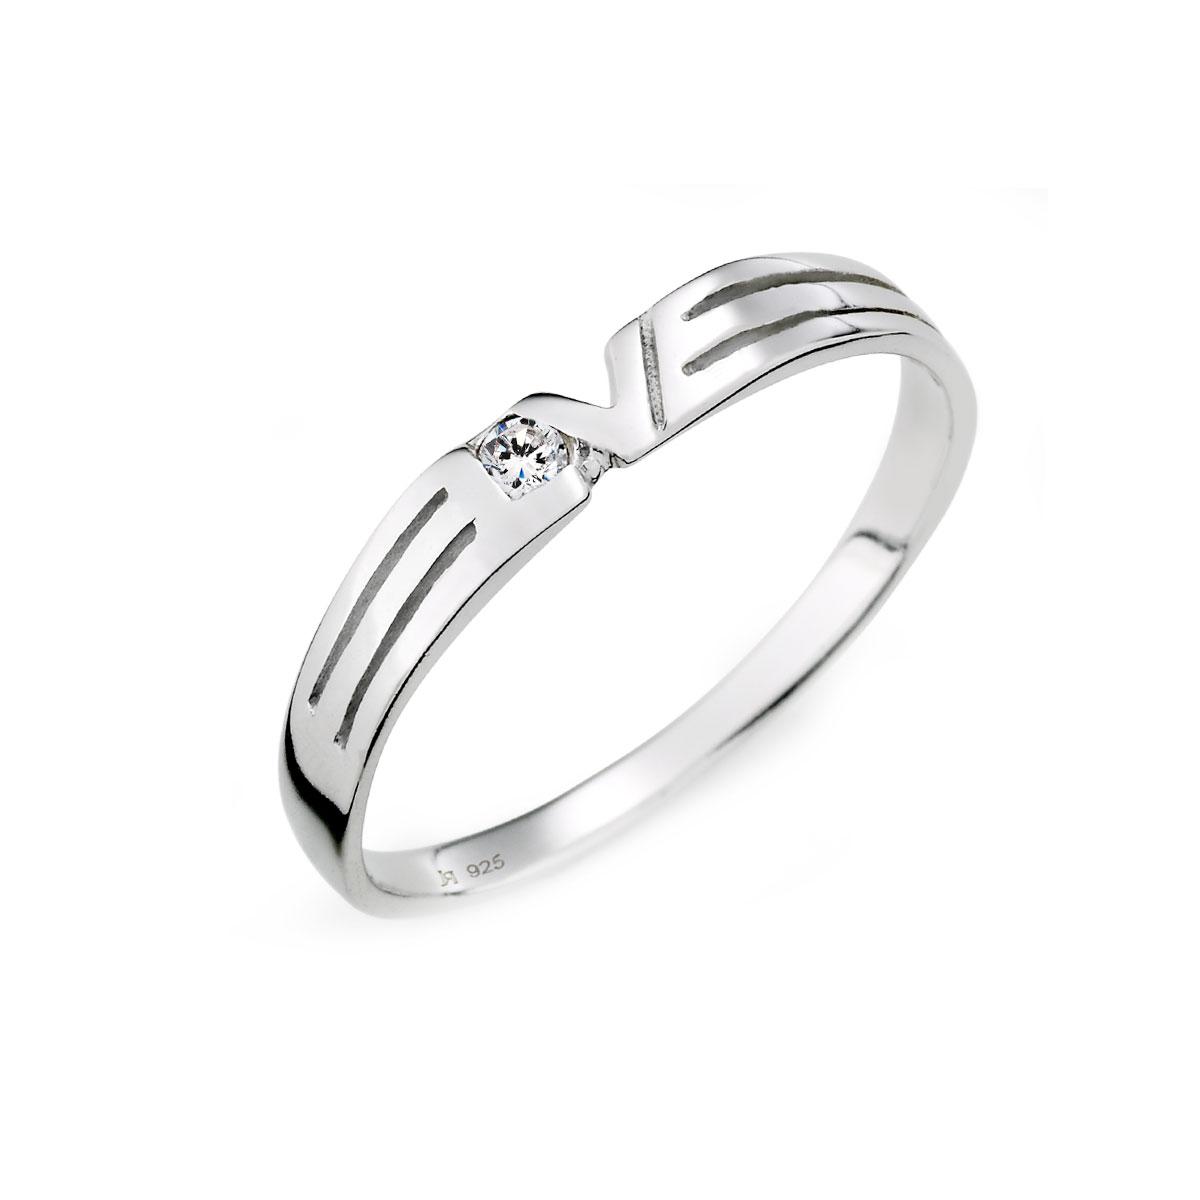 KSW249 隱藏的LOVE戒指